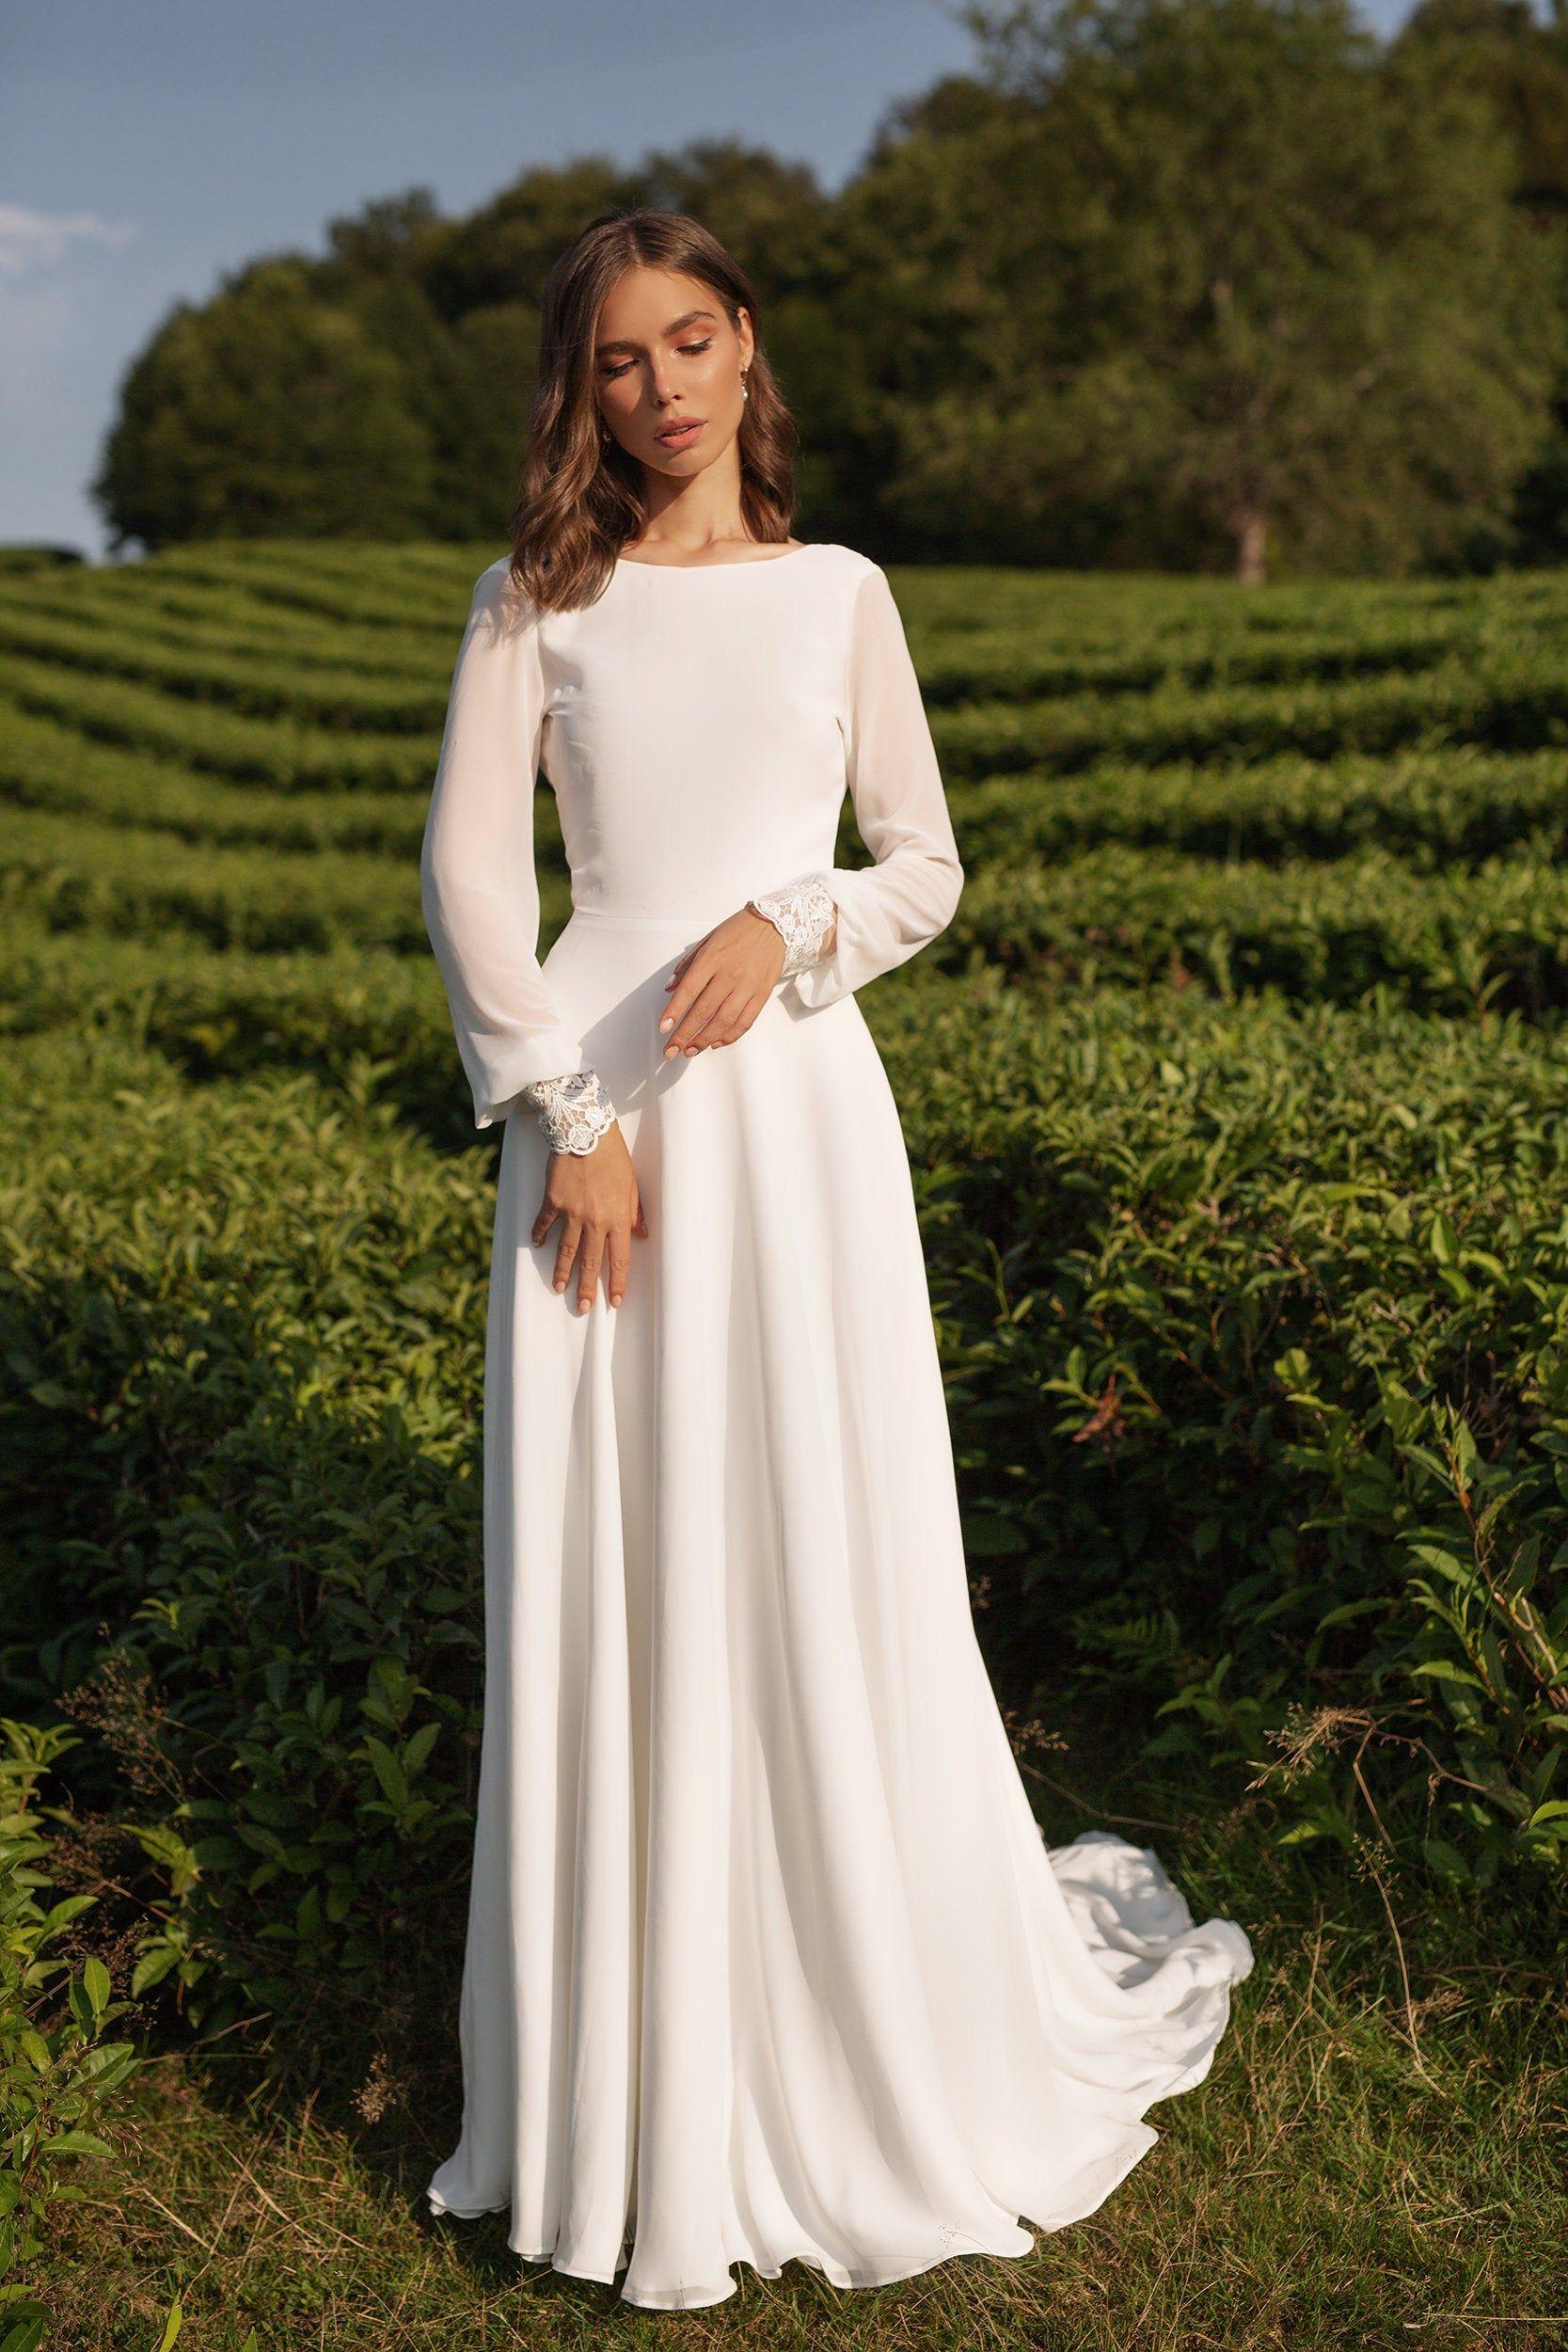 Chiffon Wedding Dress Anasteisha Long Sleeves Simple Wedding Dress With Open Back Chiffon Wedding Dress Long Wedding Dresses Wedding Dresses Simple [ 2500 x 1667 Pixel ]